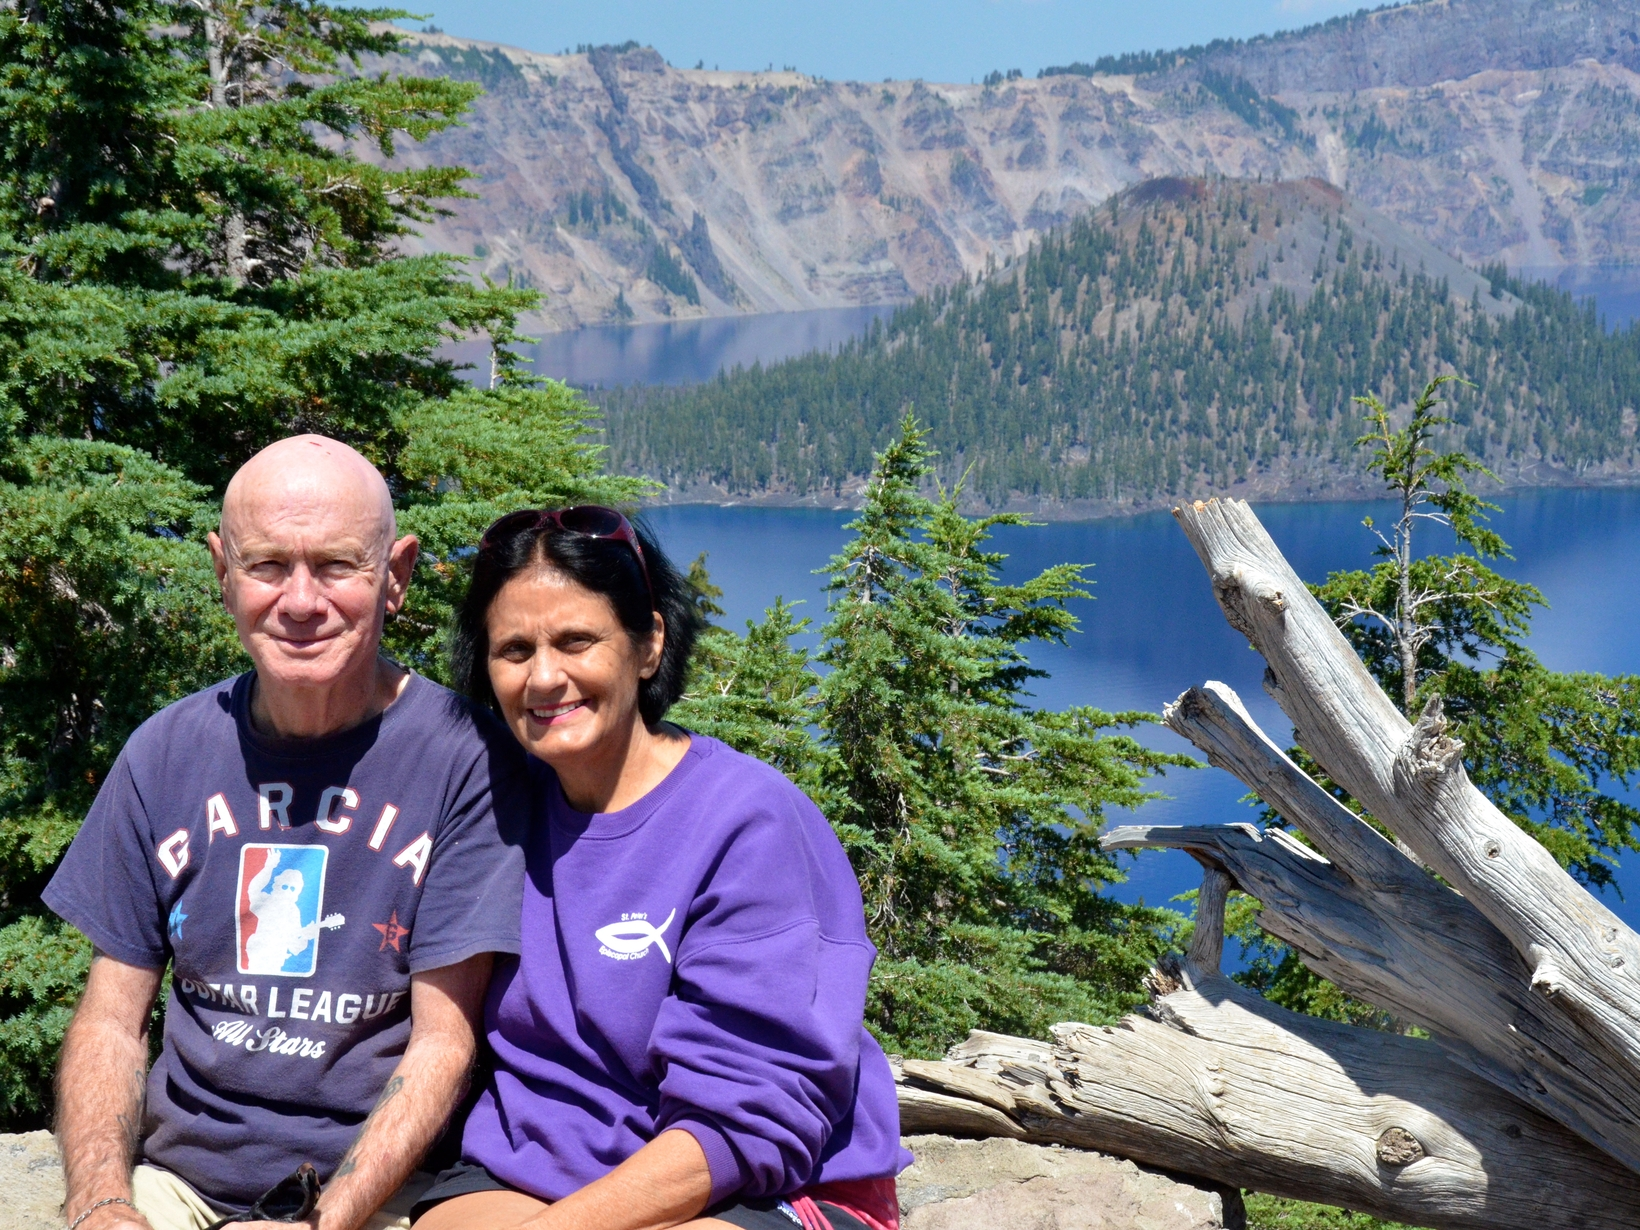 Mary and john & John from Box Elder, South Dakota, United States